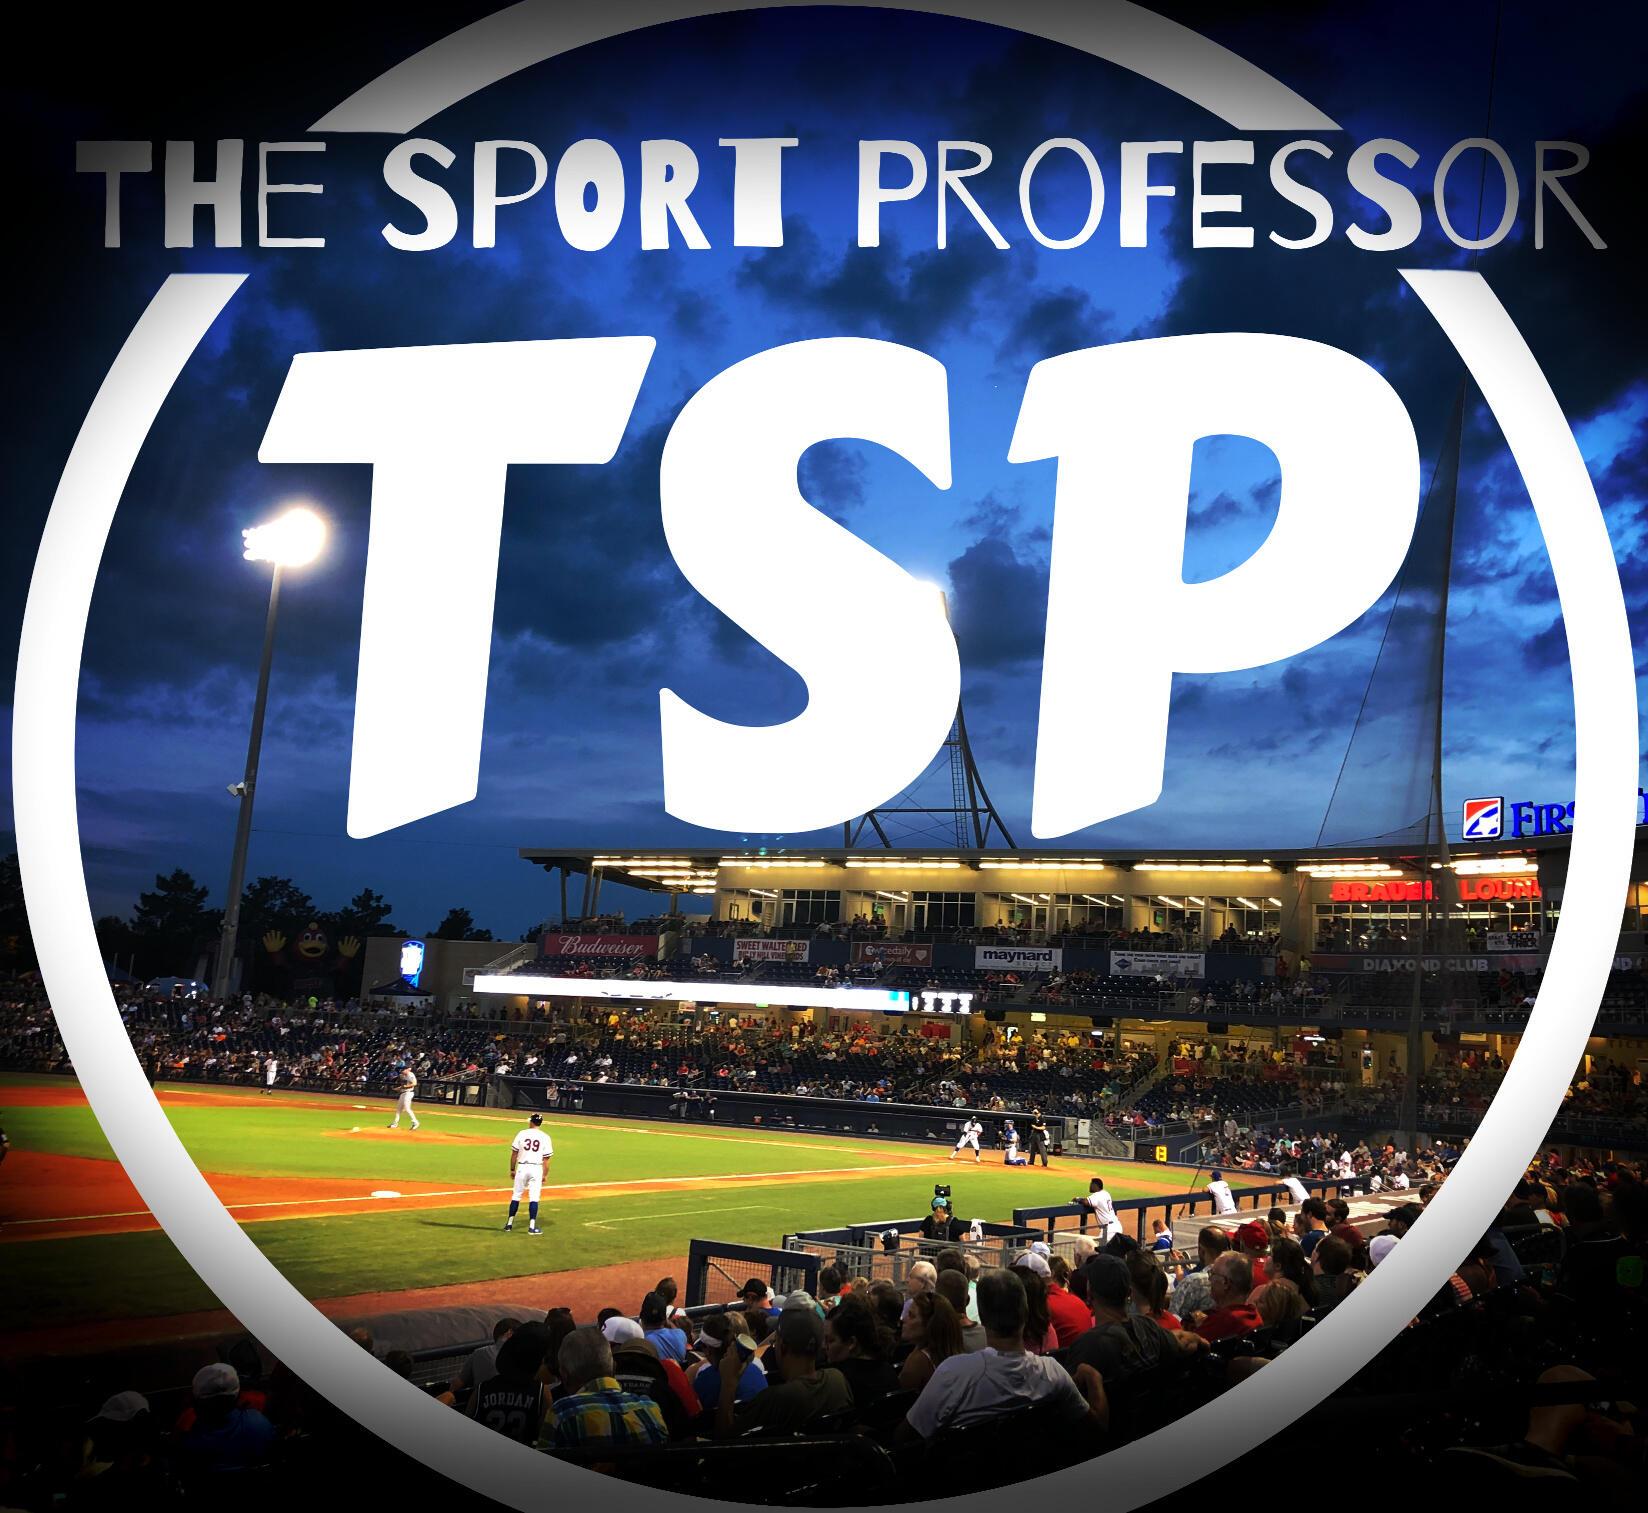 The Sport Professor Podcast